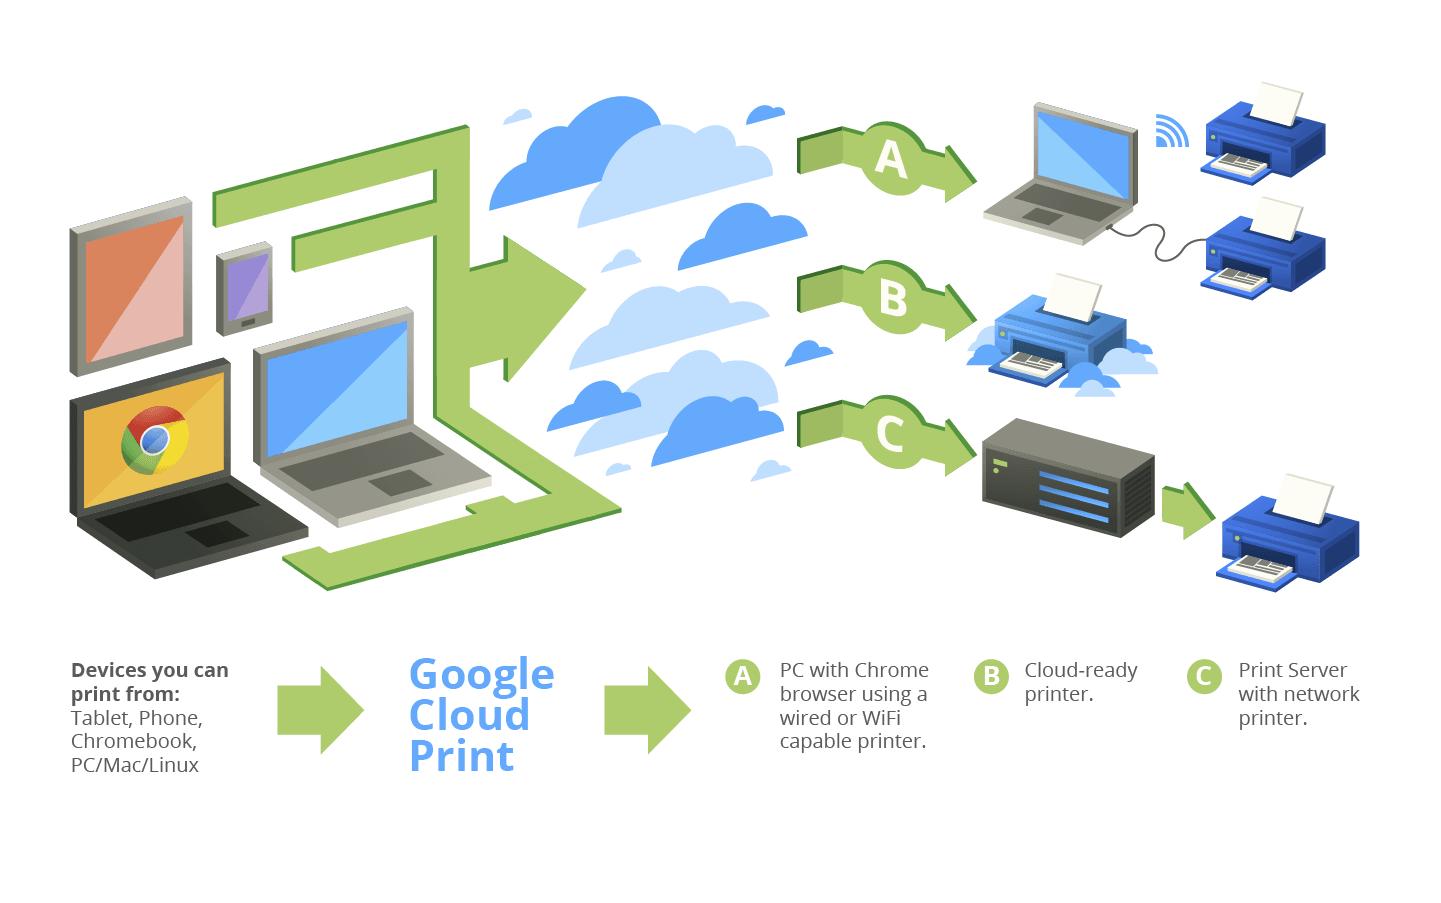 cloudprint2 DzTechs - كيفية طباعة جميع أنواع الملفات من هاتف Android الخاص بك